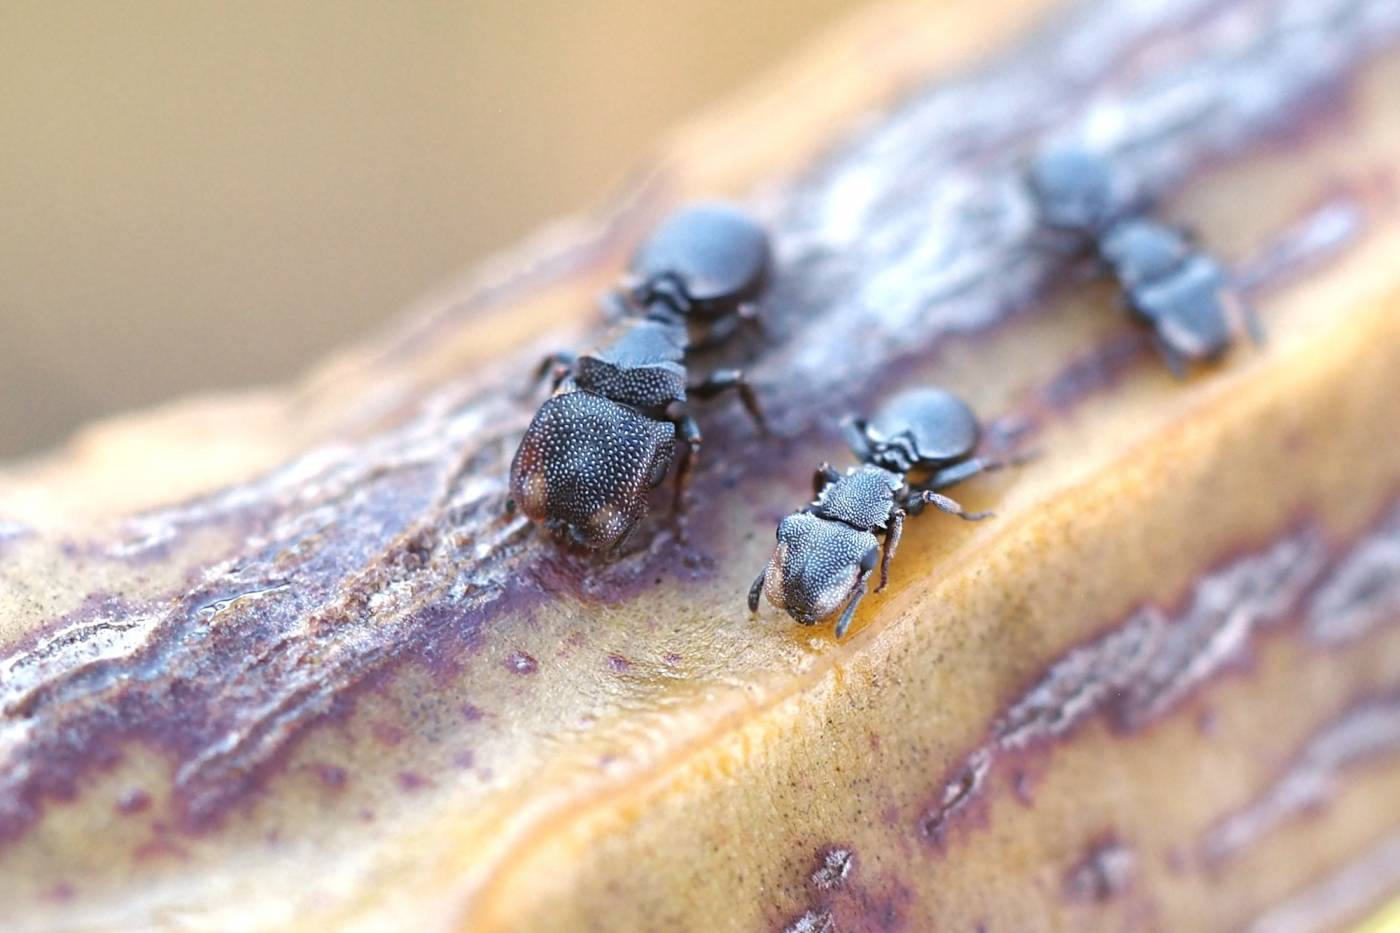 Turtle ants